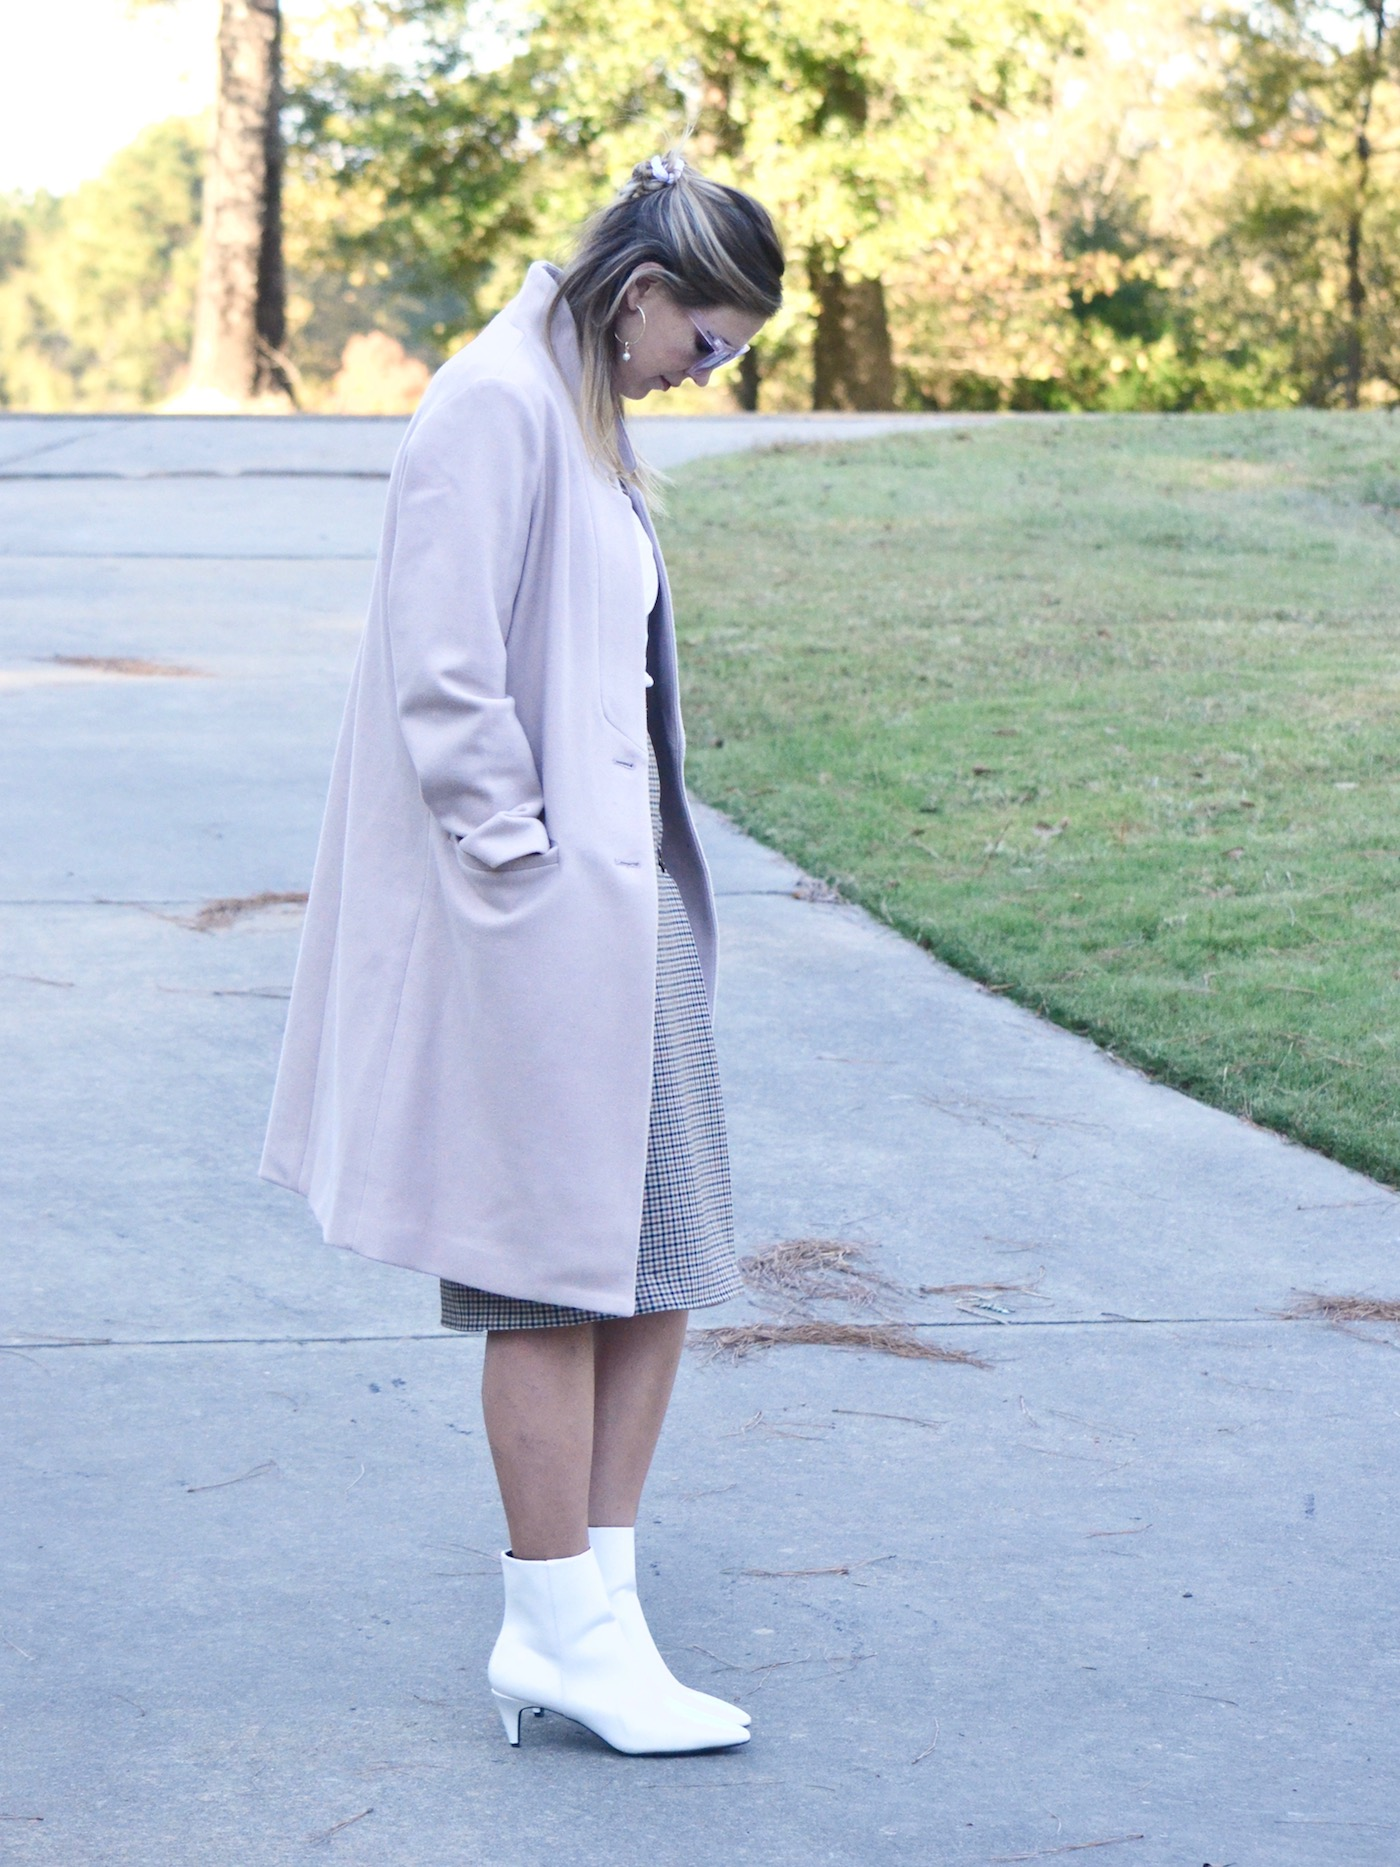 Overcoat // www.thehiveblog.com